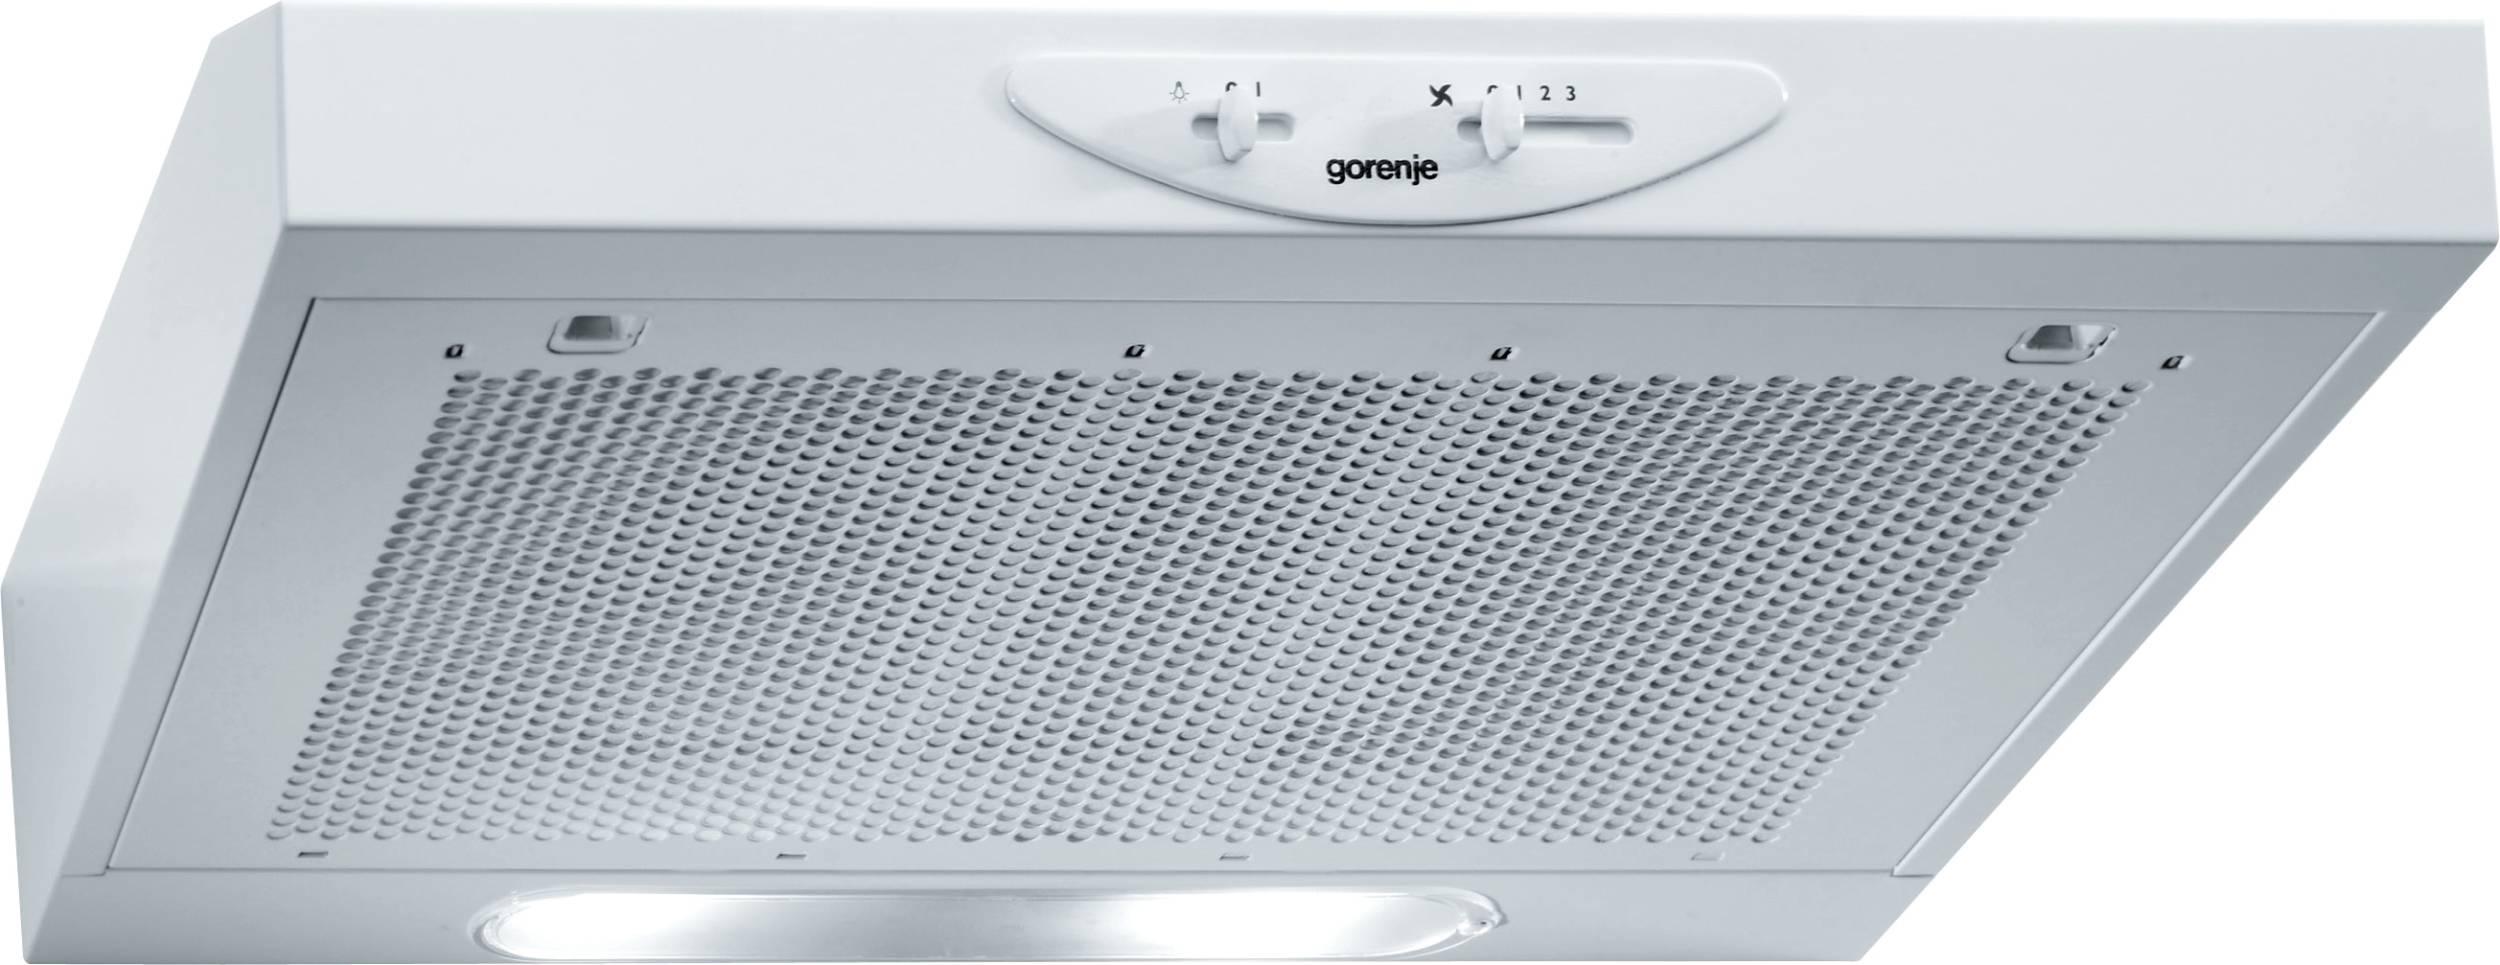 Gorenje DU611W Podugradni kuhinjski aspirator 59,9 × 13,2 × 51 cm